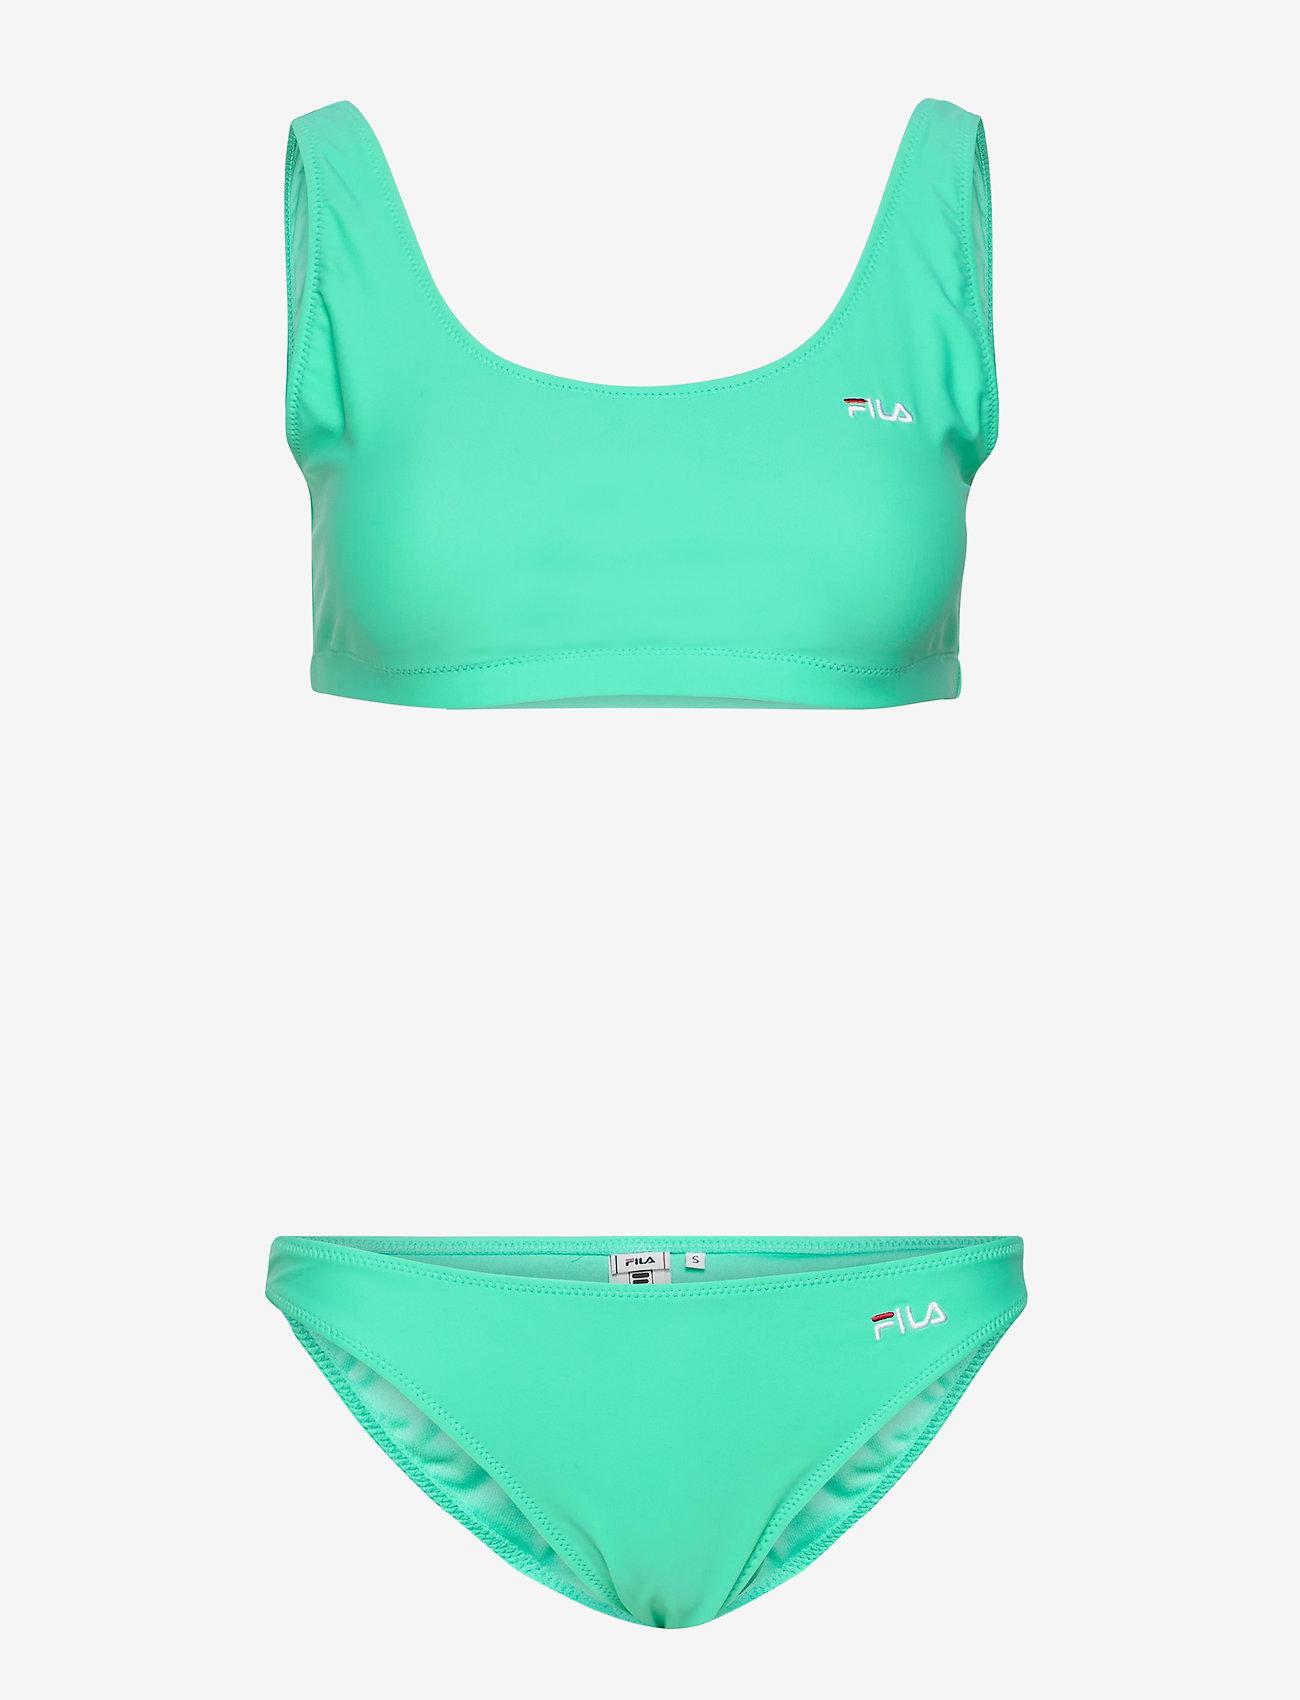 FILA - WOMEN SOFIA bikini / tango panty - 2 pièces - set - biscay green - 0